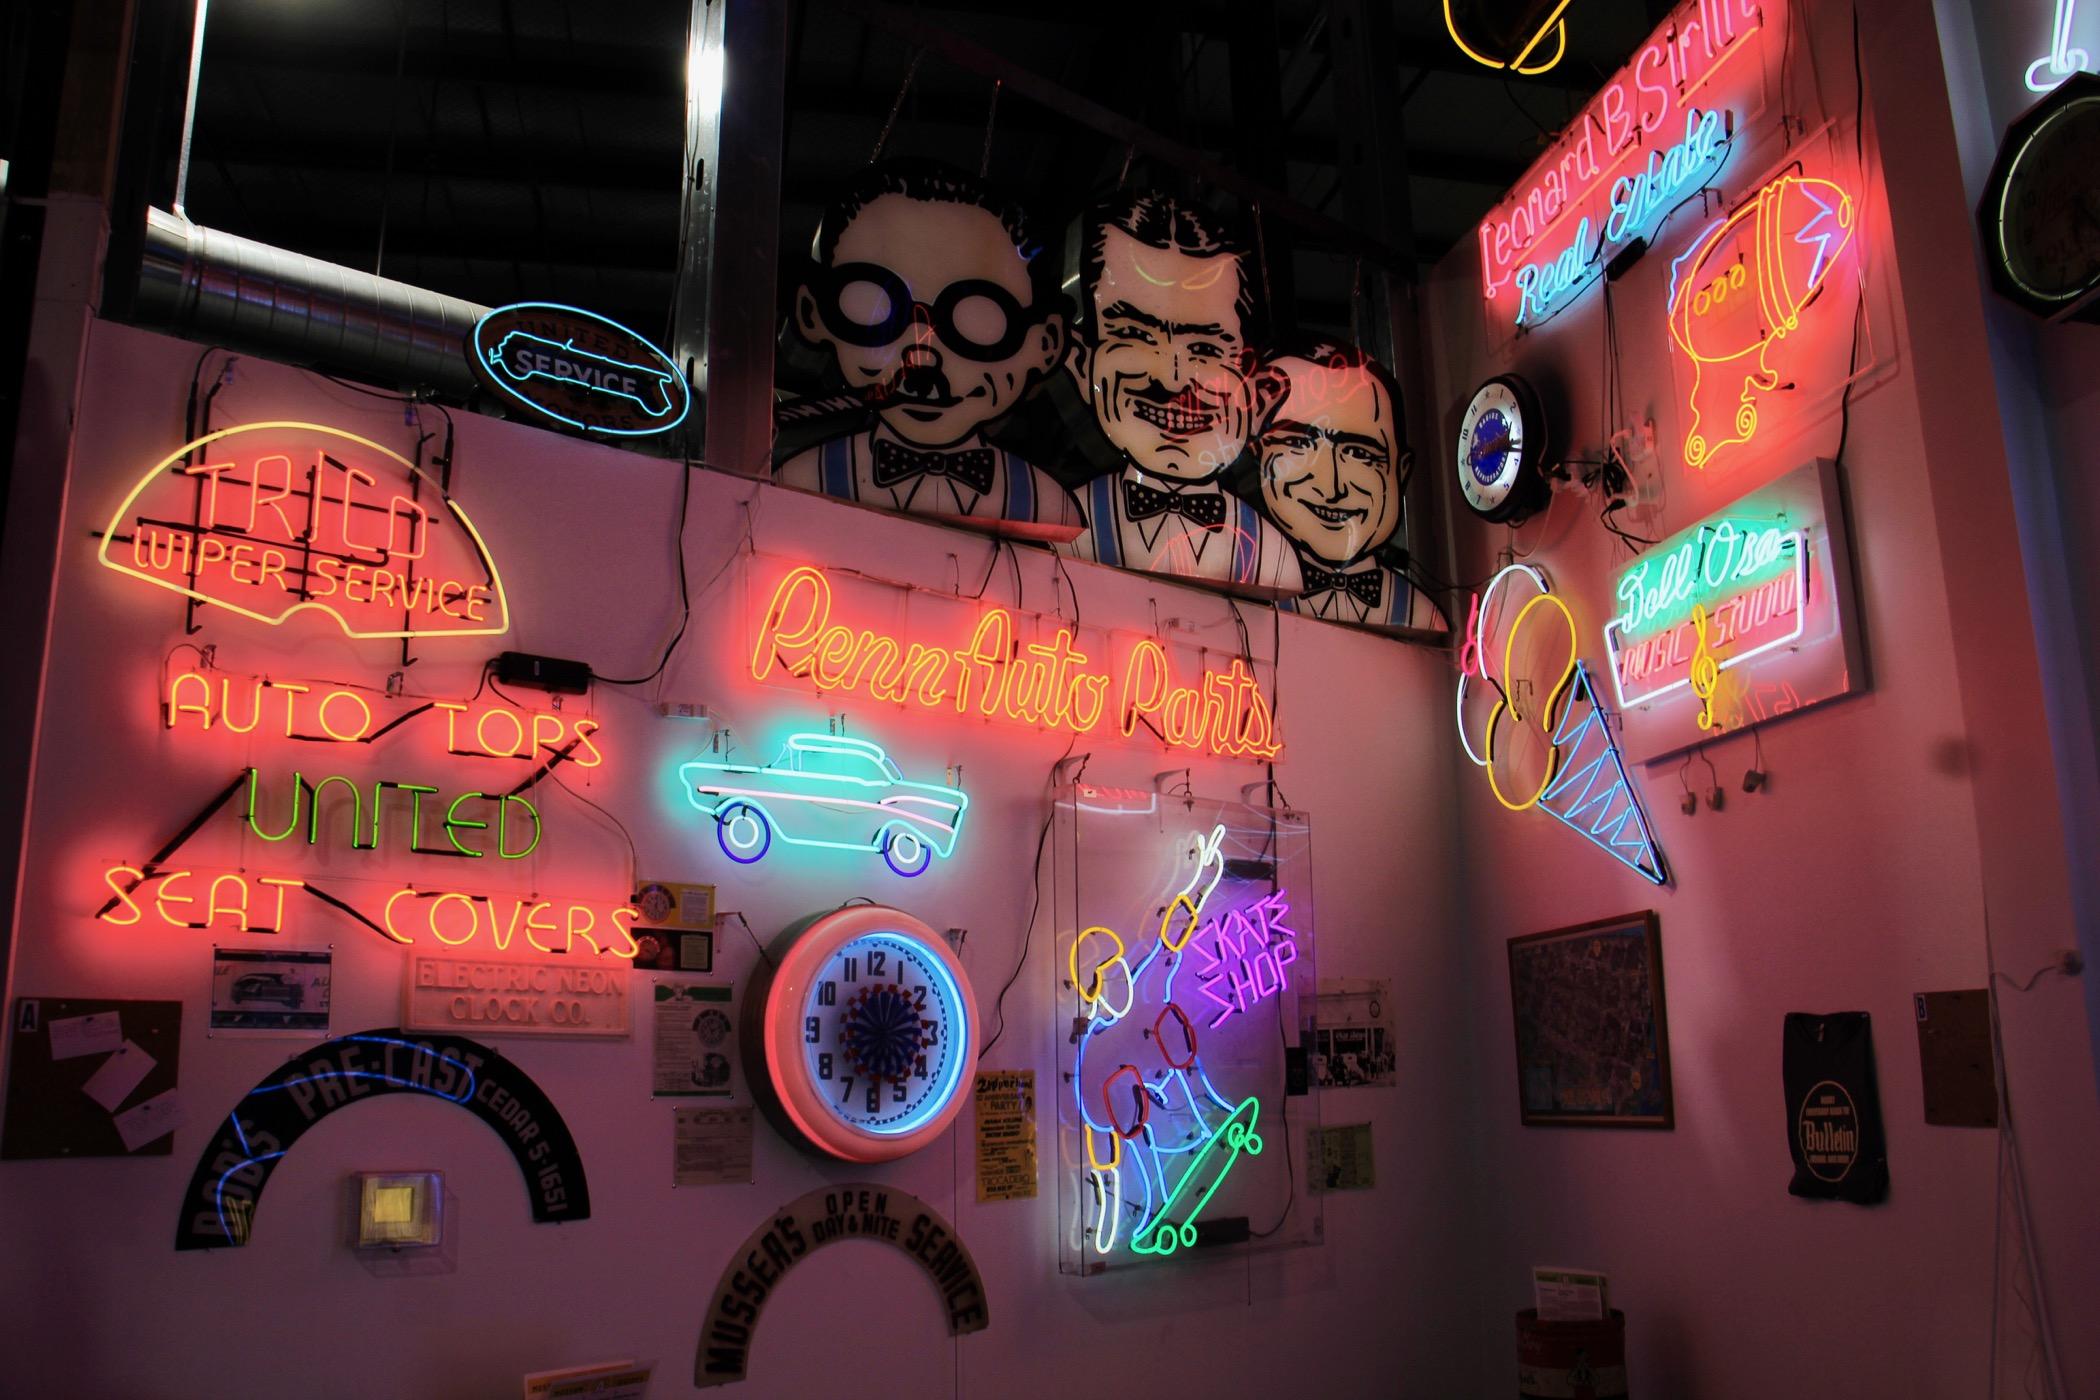 https://whyy.org/wp-content/uploads/2021/04/2021-04-21-e-lee-philadelphia-nexfab-building-neon-museum-auto-1.jpg